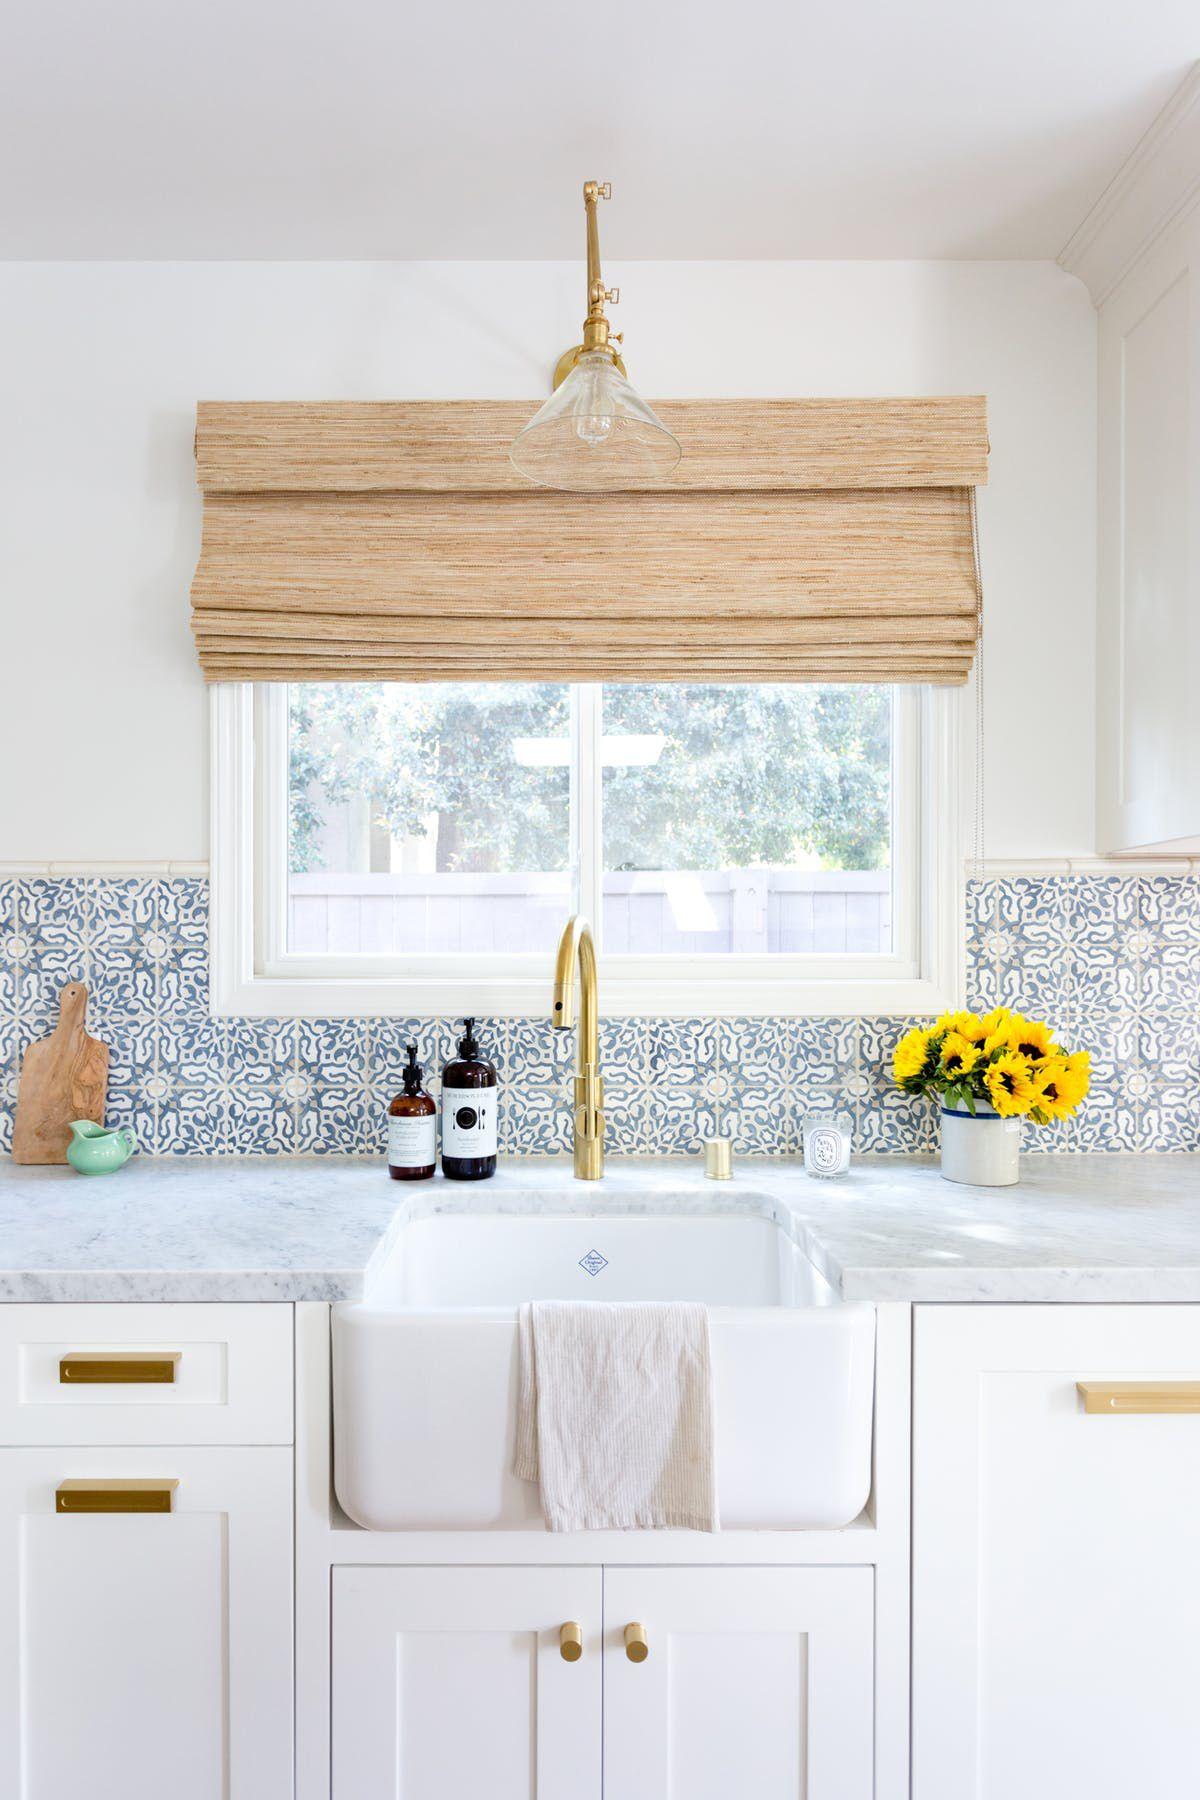 Kitchen Backsplash Styling Tips from   Experts